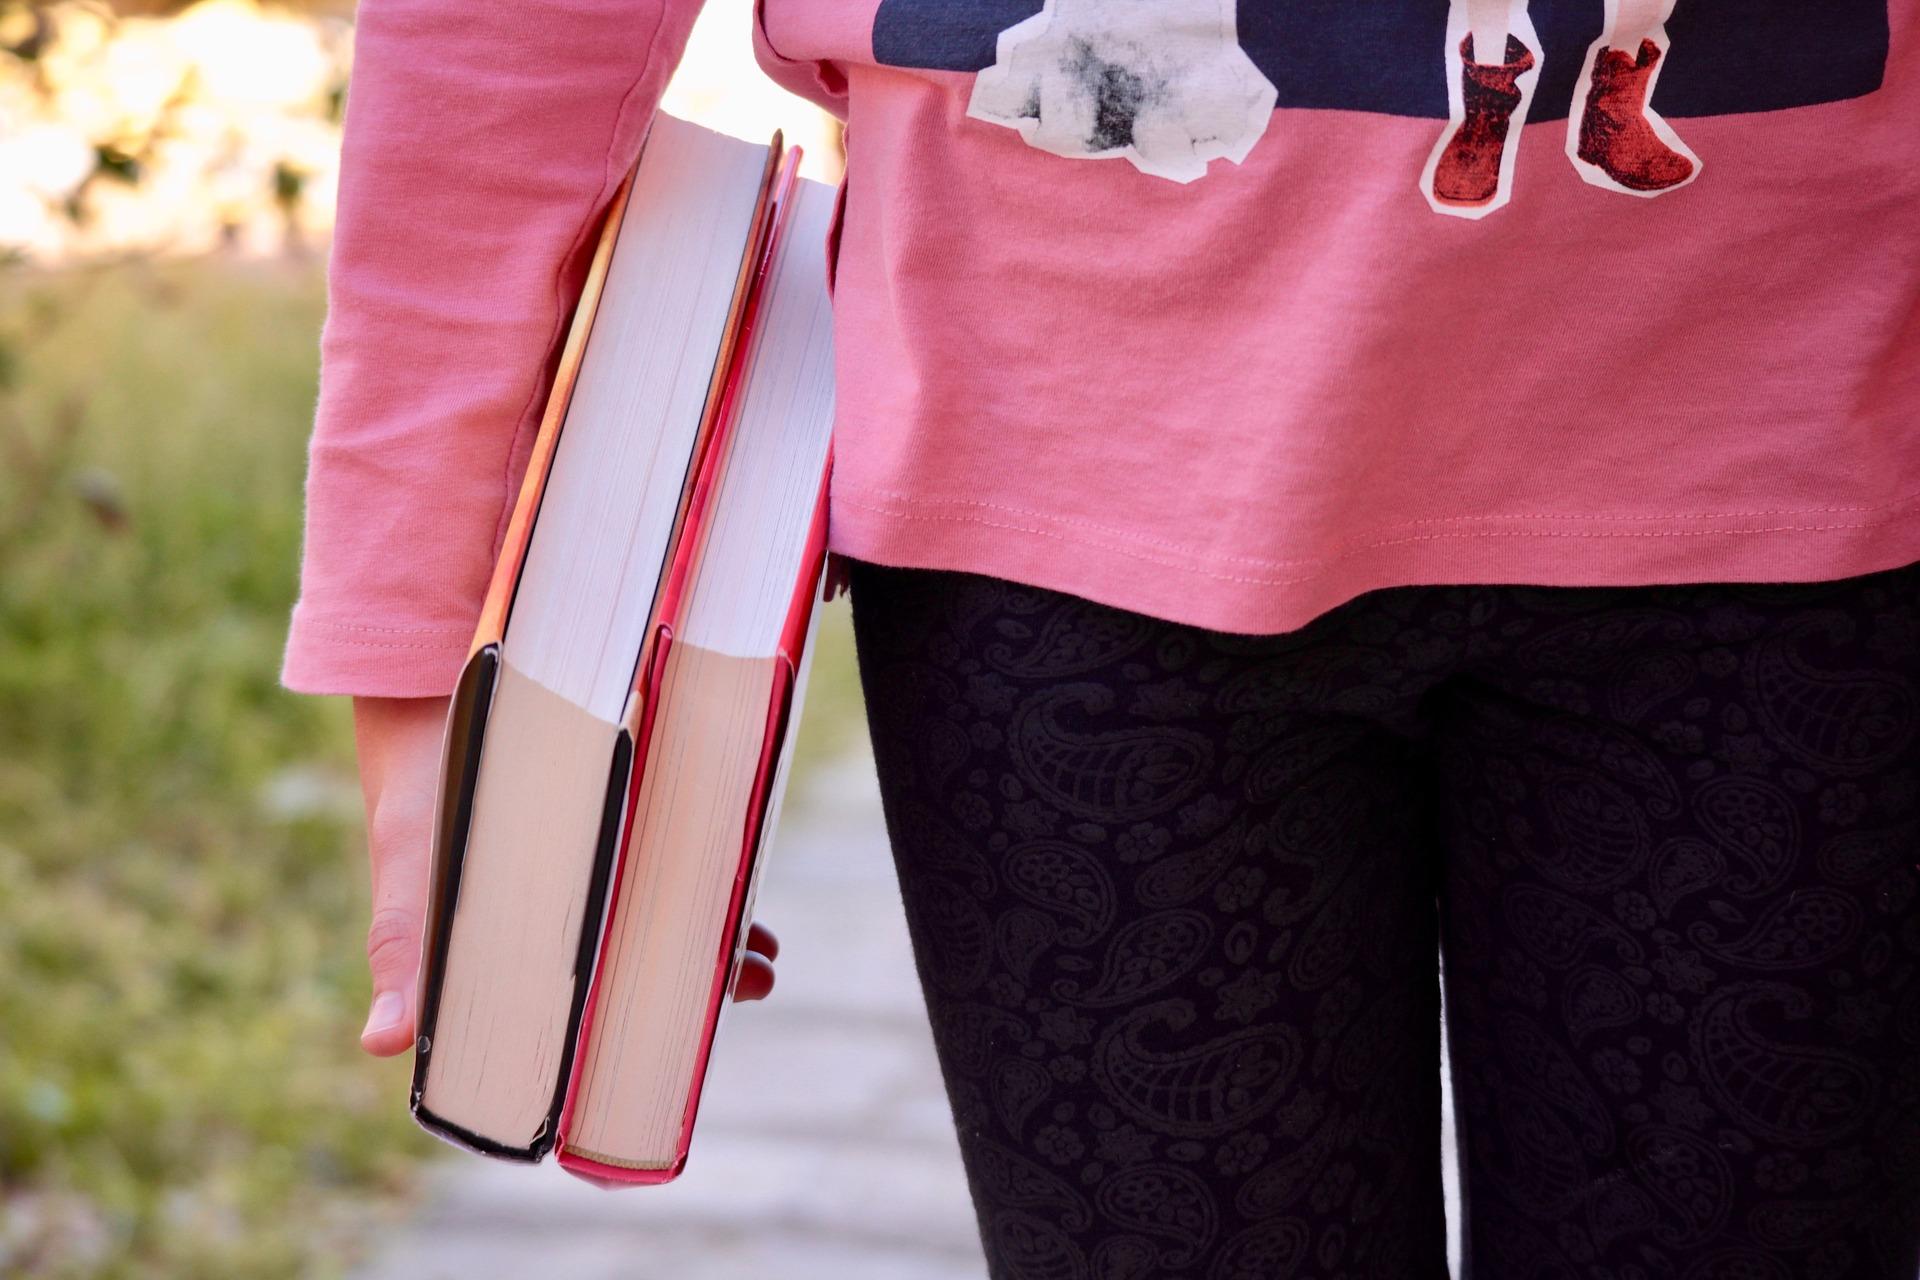 books-2182454_1920